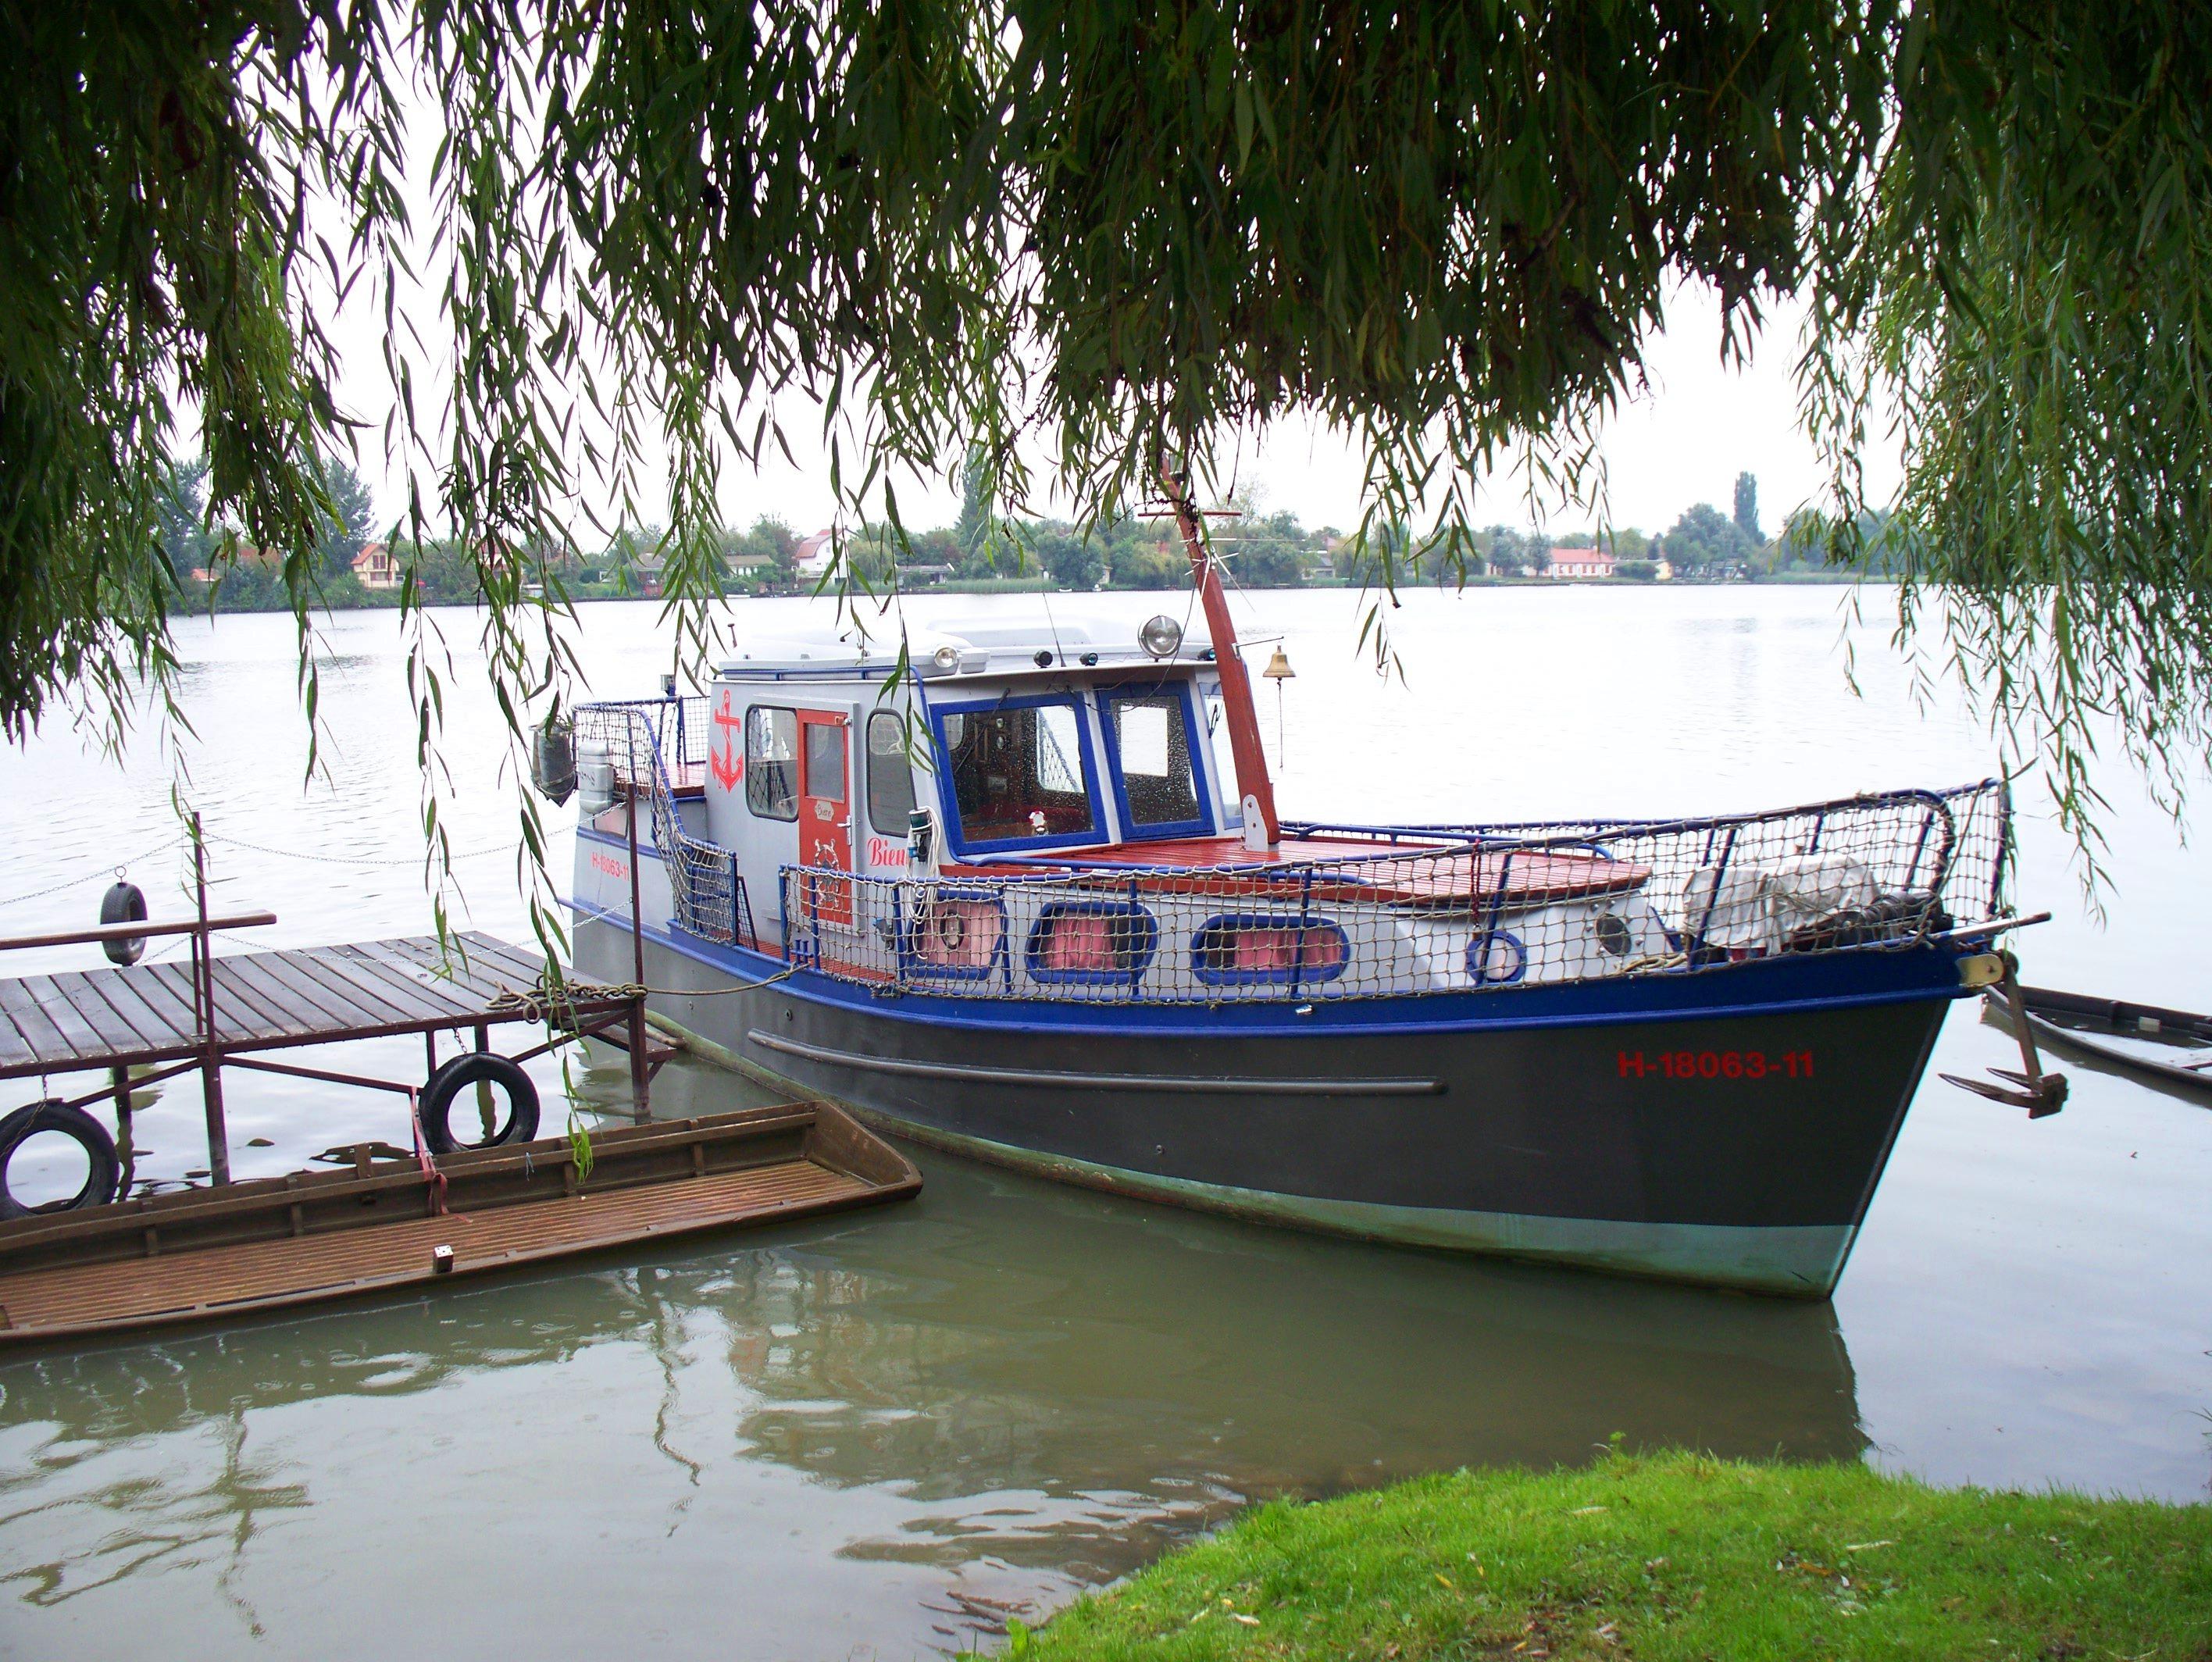 http://www.kisdunainagyhajok.hu/egyebhajok/2010_09_19_biene_lakohajo_aszok_napon_kikotve/2010_09_19_biene_lakohajo_aszok_napon_kikotve_003.jpg